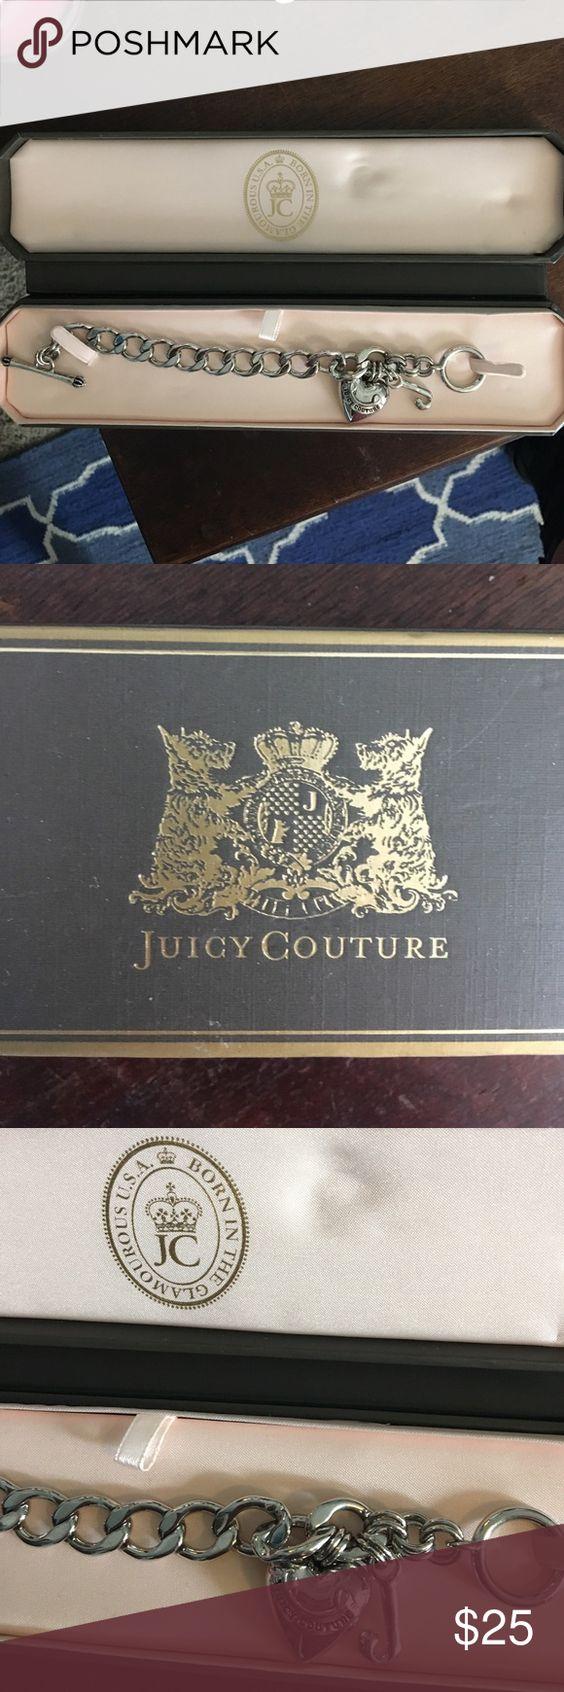 Juicy Couture Charm Bracelet Never Worn! Juicy Couture Charm Bracelet,  Color Is